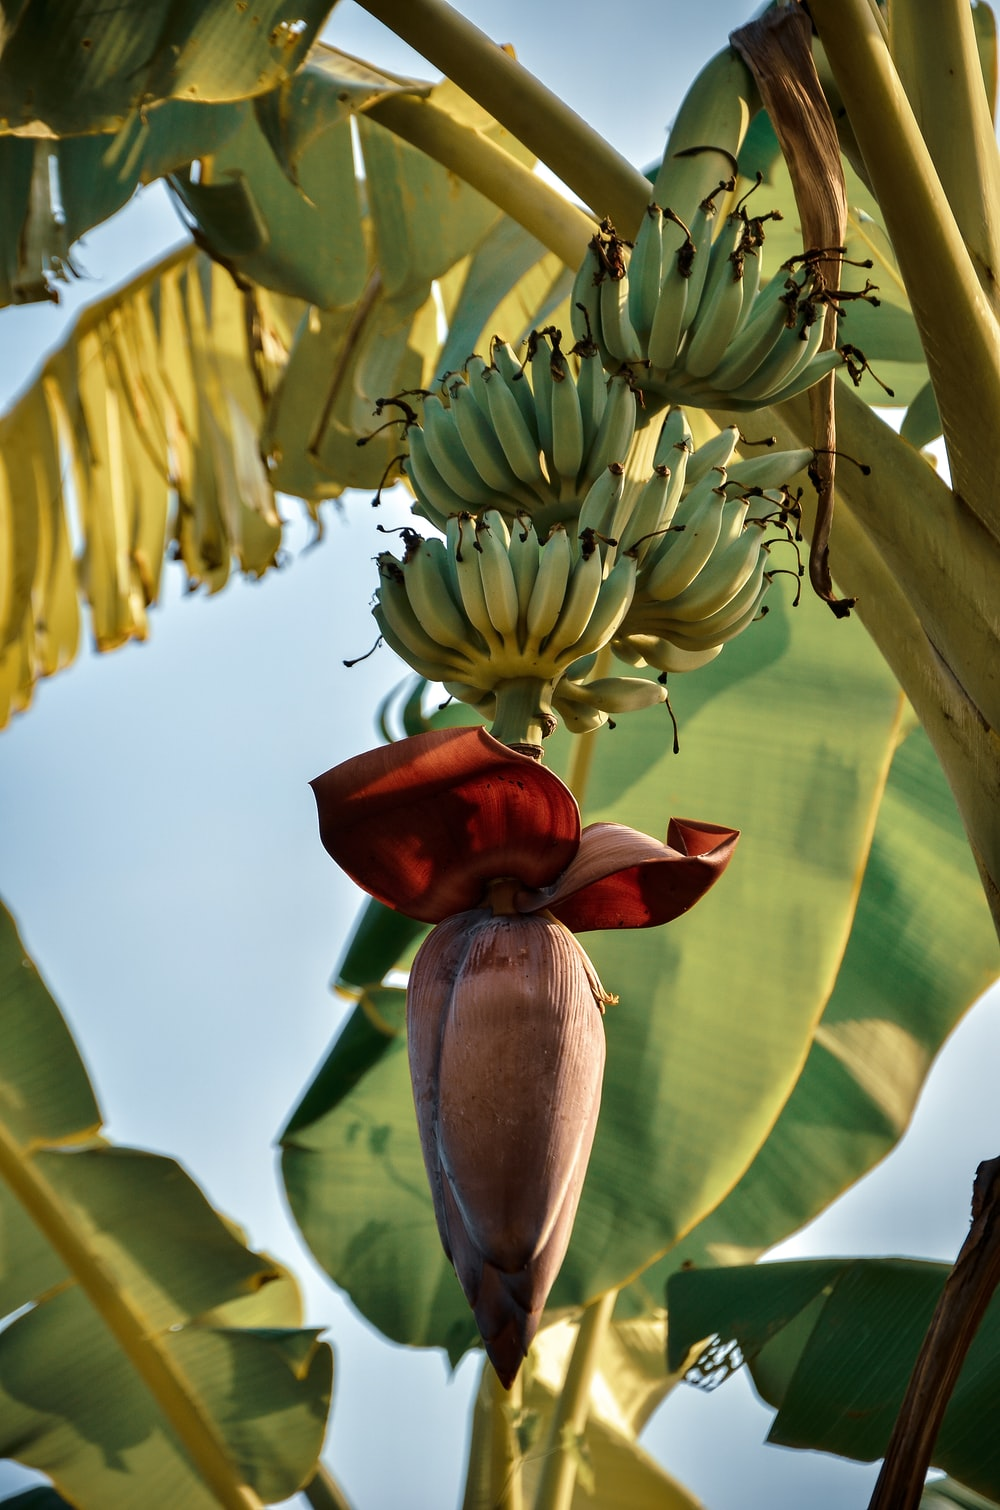 low angle photo of banana tree during daytime